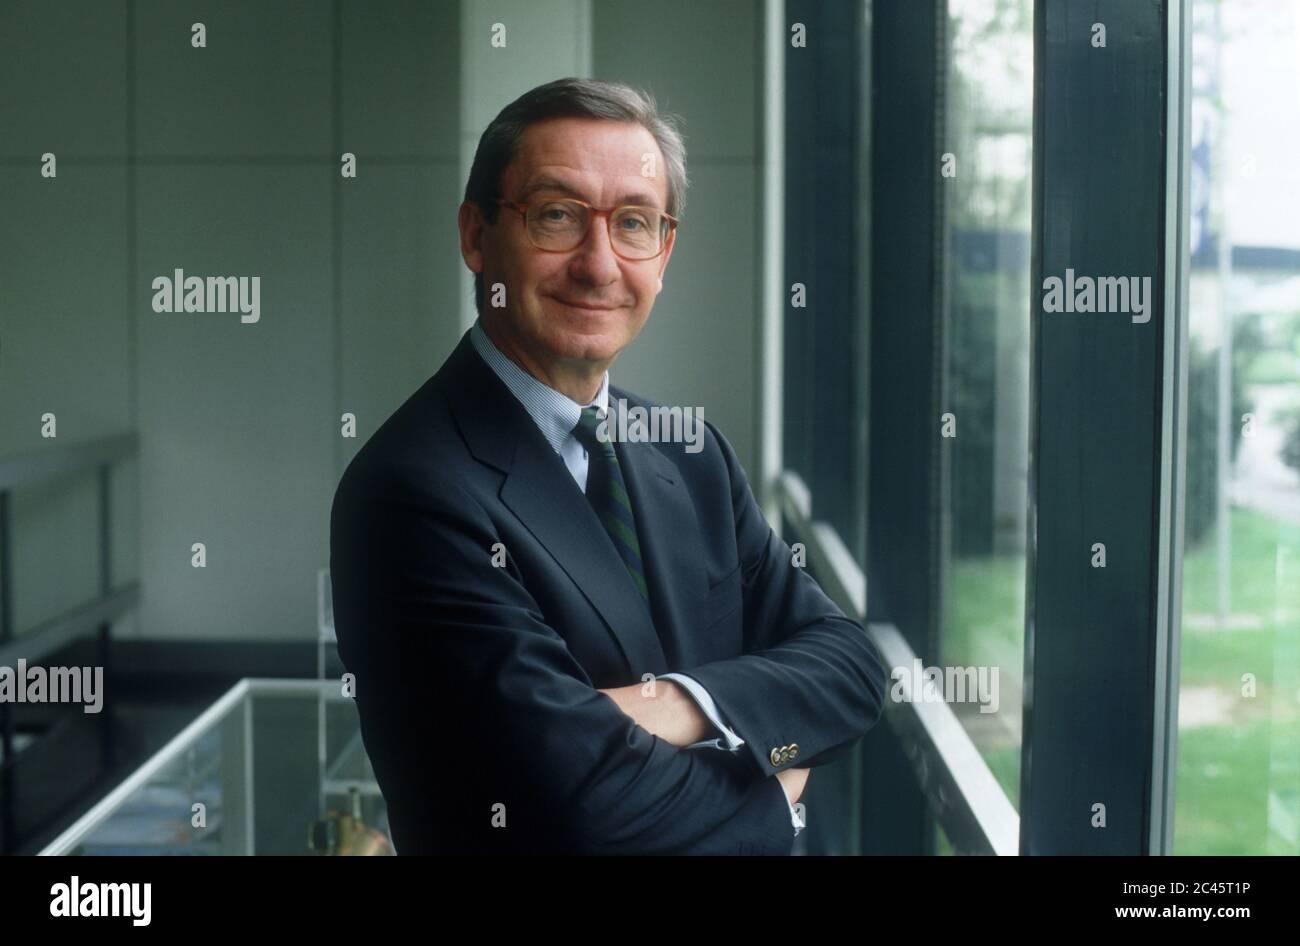 Dr. Ulrich Lehner - CEO of Henkel KGaA - Germany Stock Photo